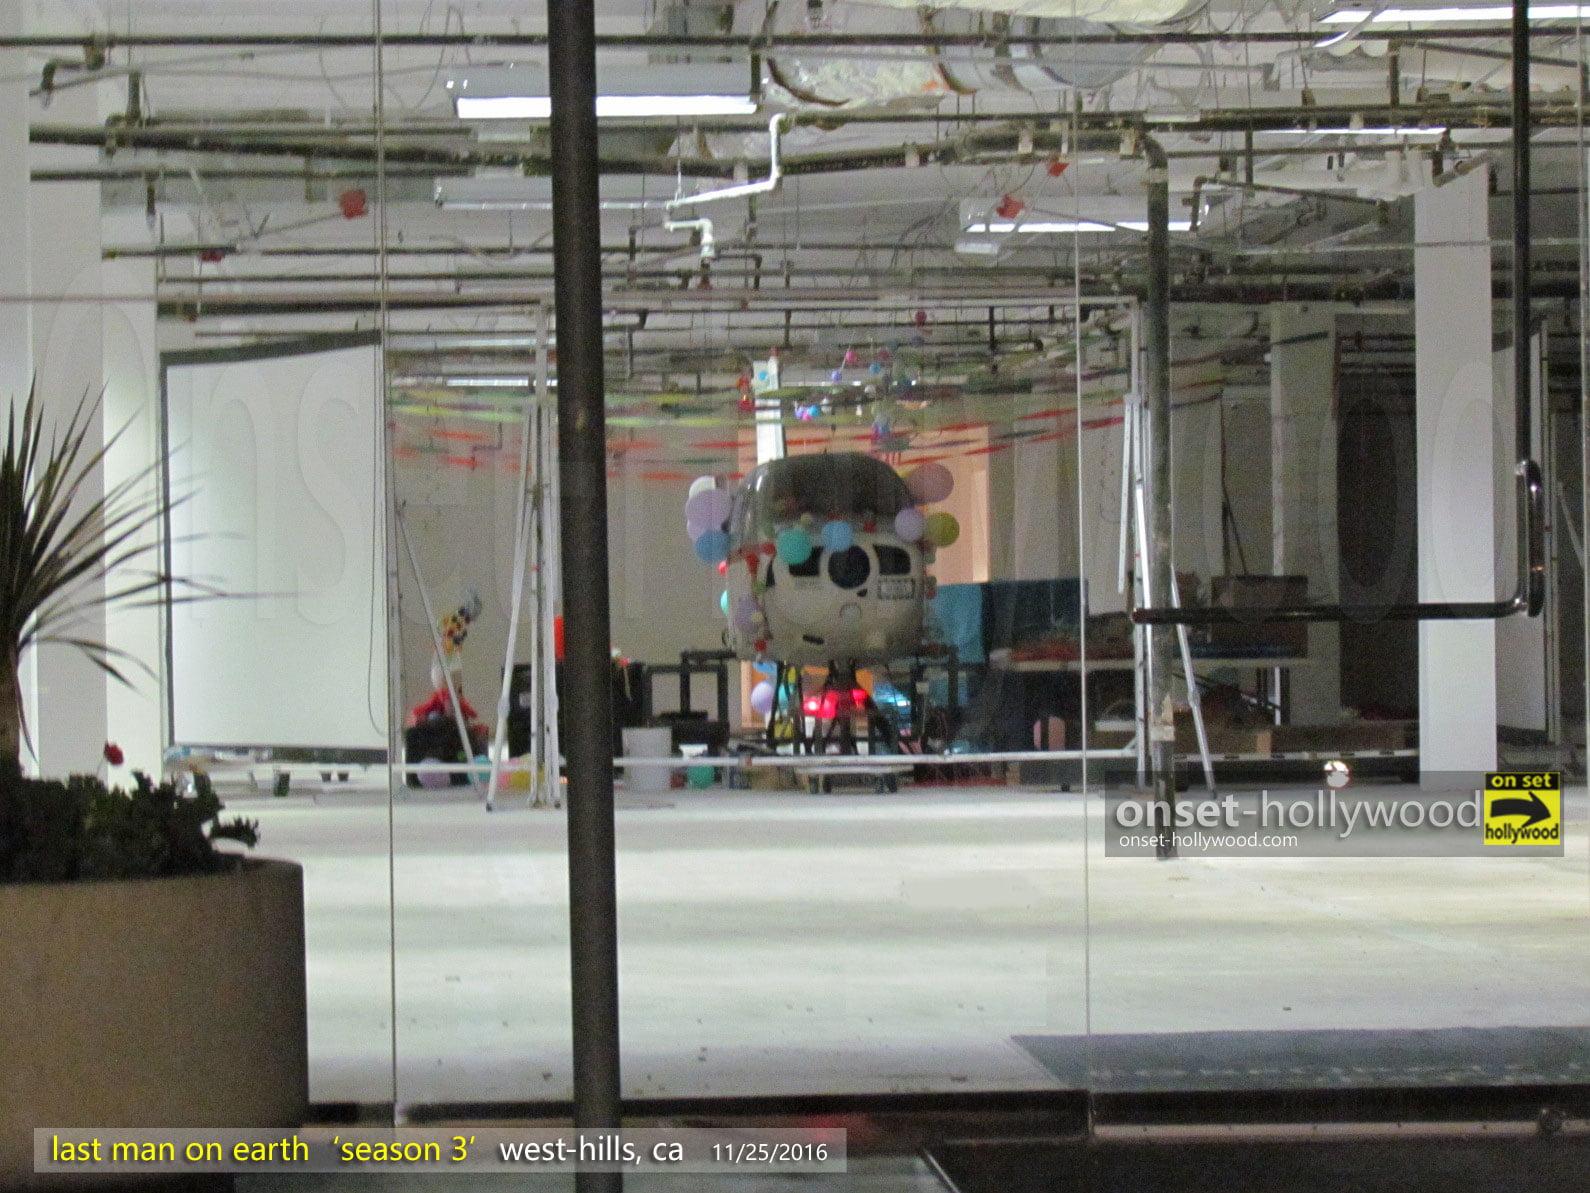 the-last-man-on-earth-season-3-filming-locations-lewis-plane